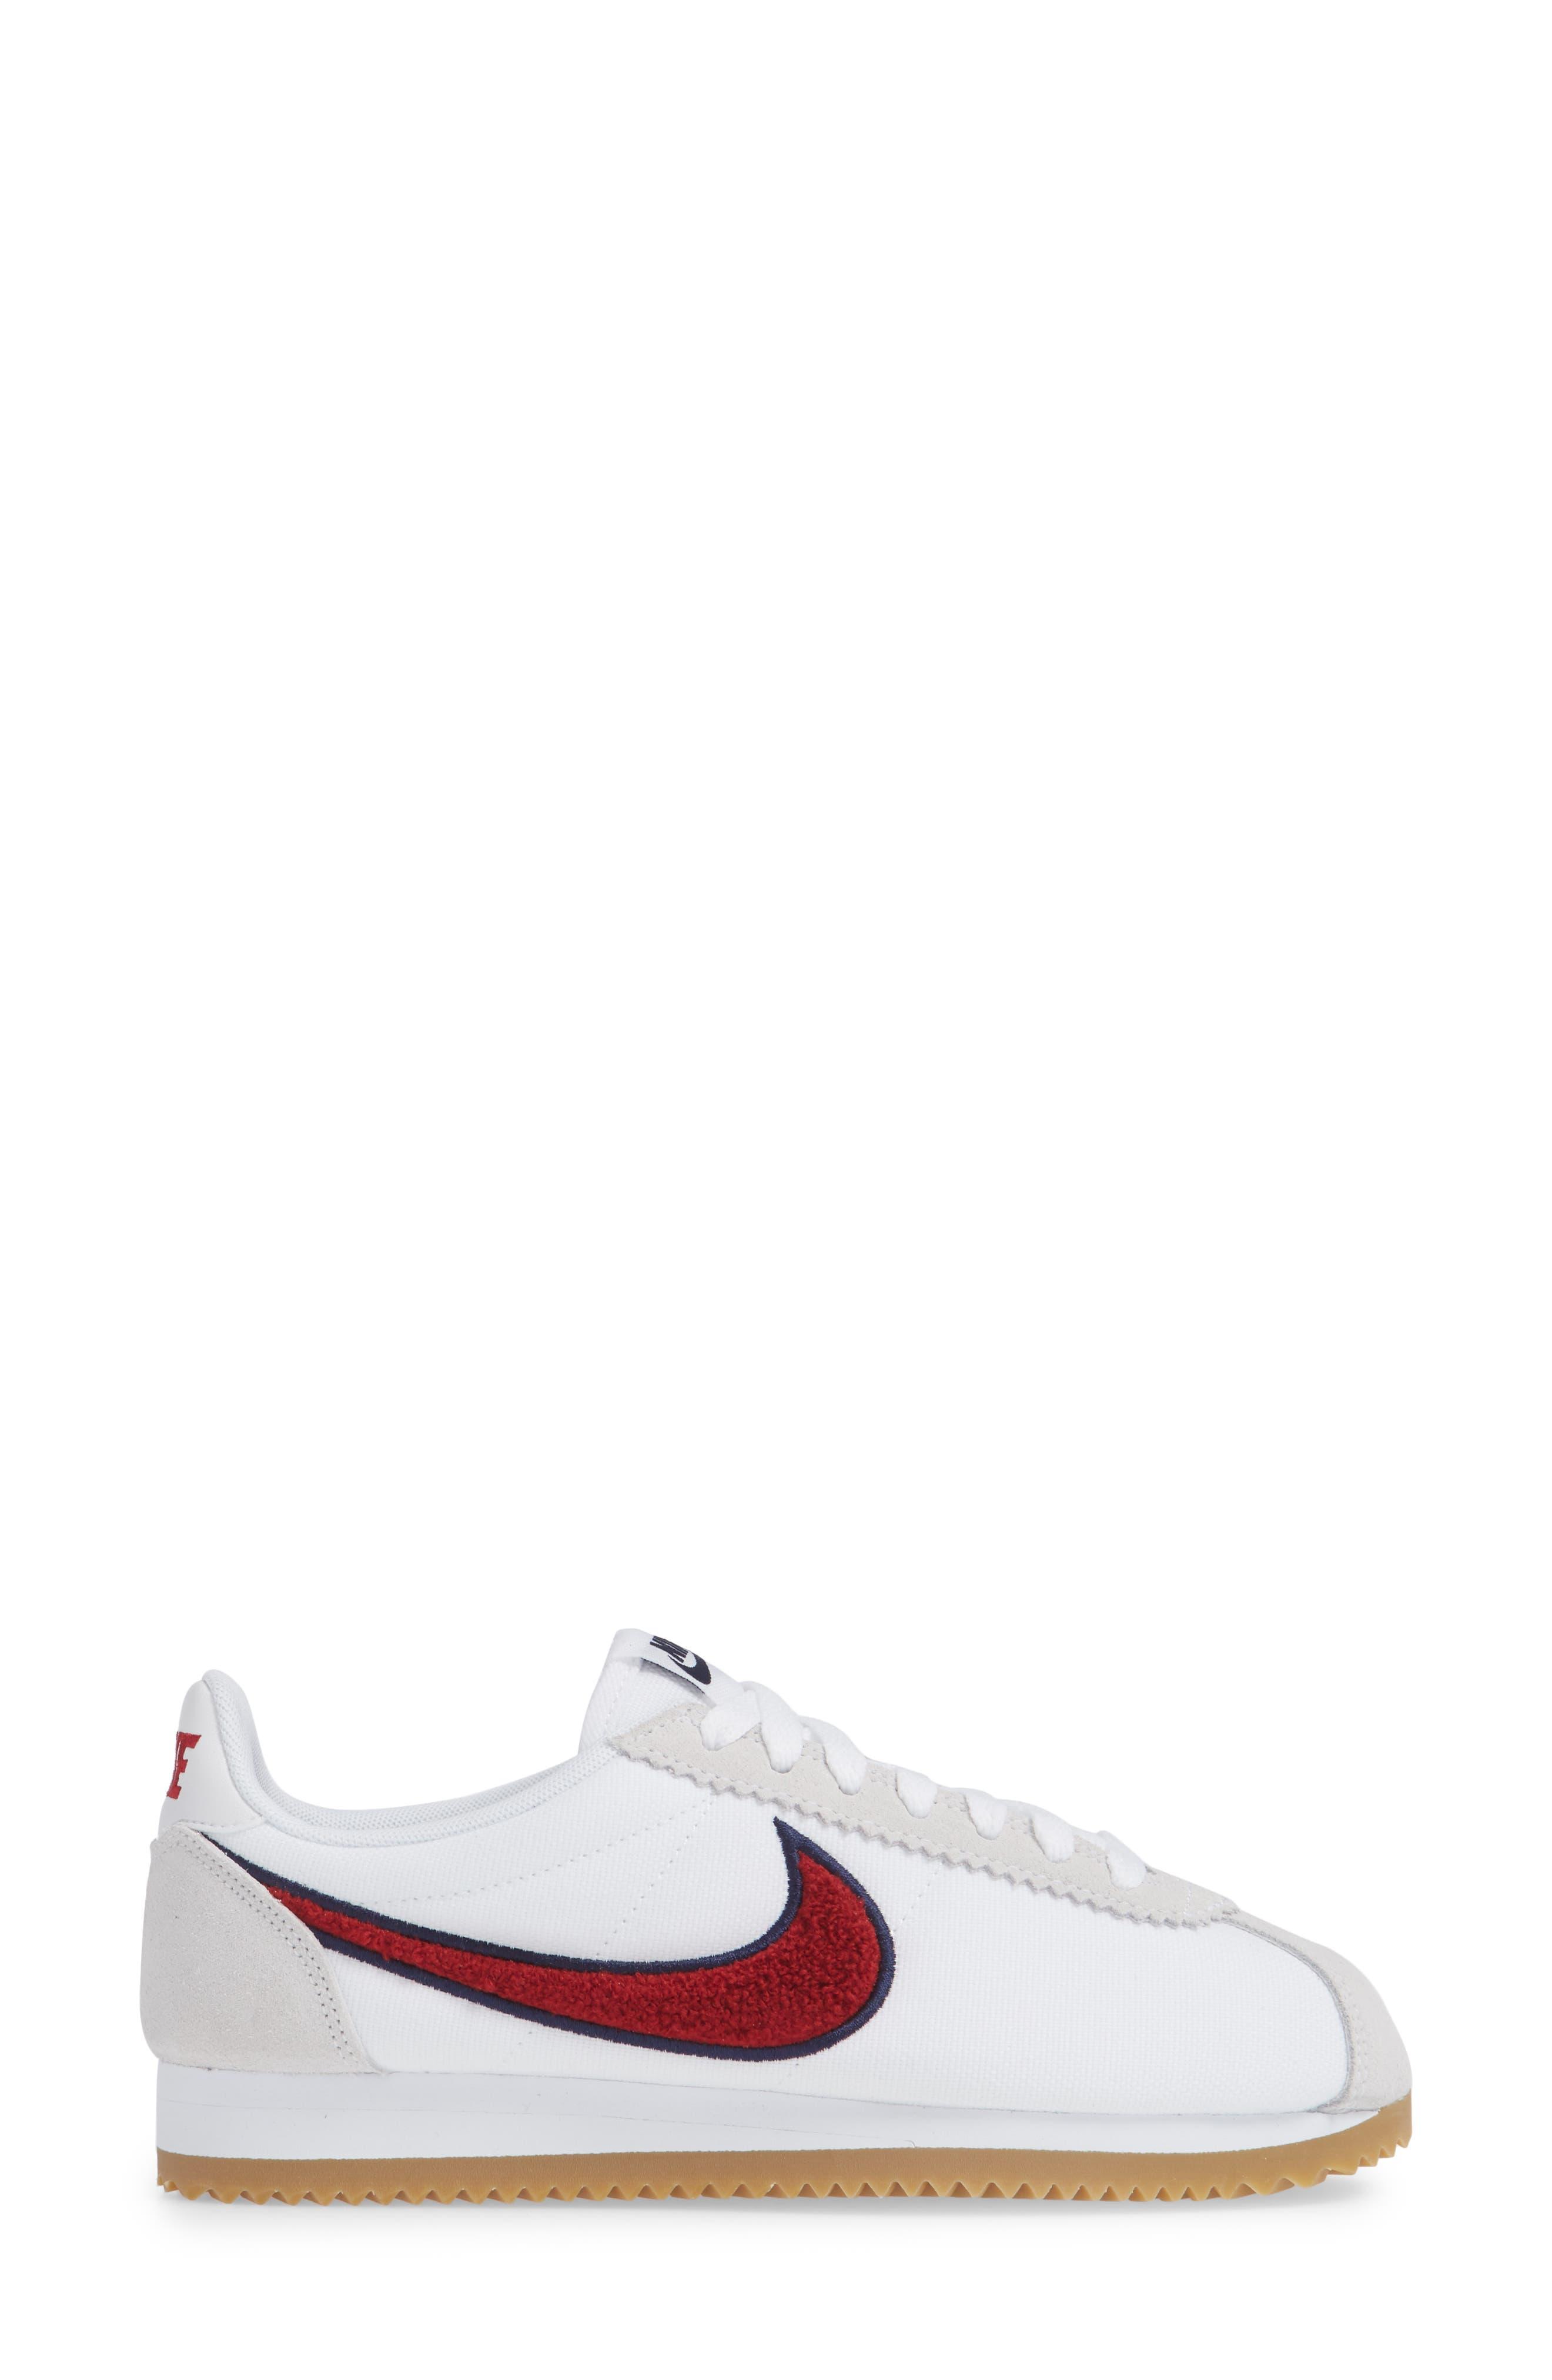 Classic Cortez Premium XLV Sneaker,                             Alternate thumbnail 3, color,                             WHITE/ RED CRUSH/ LIGHT BROWN